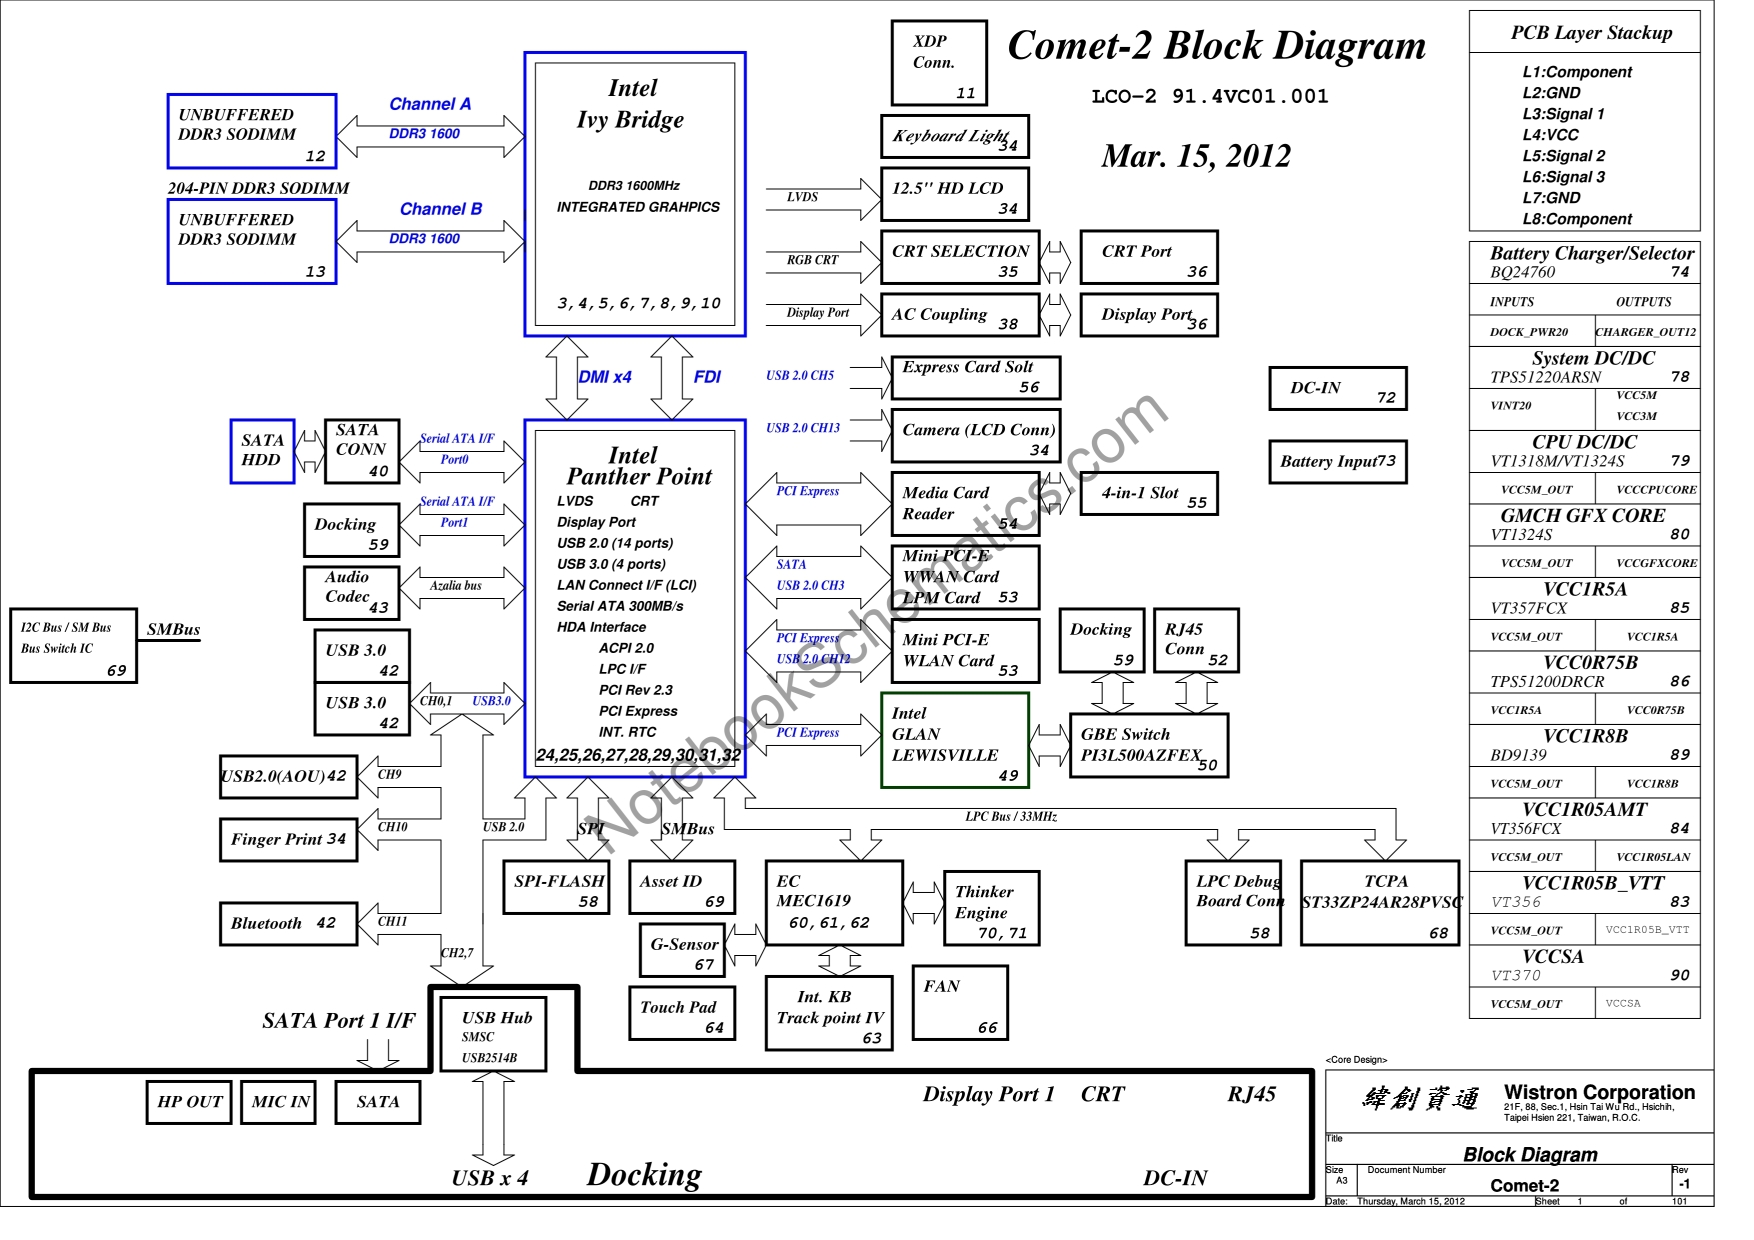 lenovo thinkpad x230t schematic  u2013 wistron comet-2 schematic